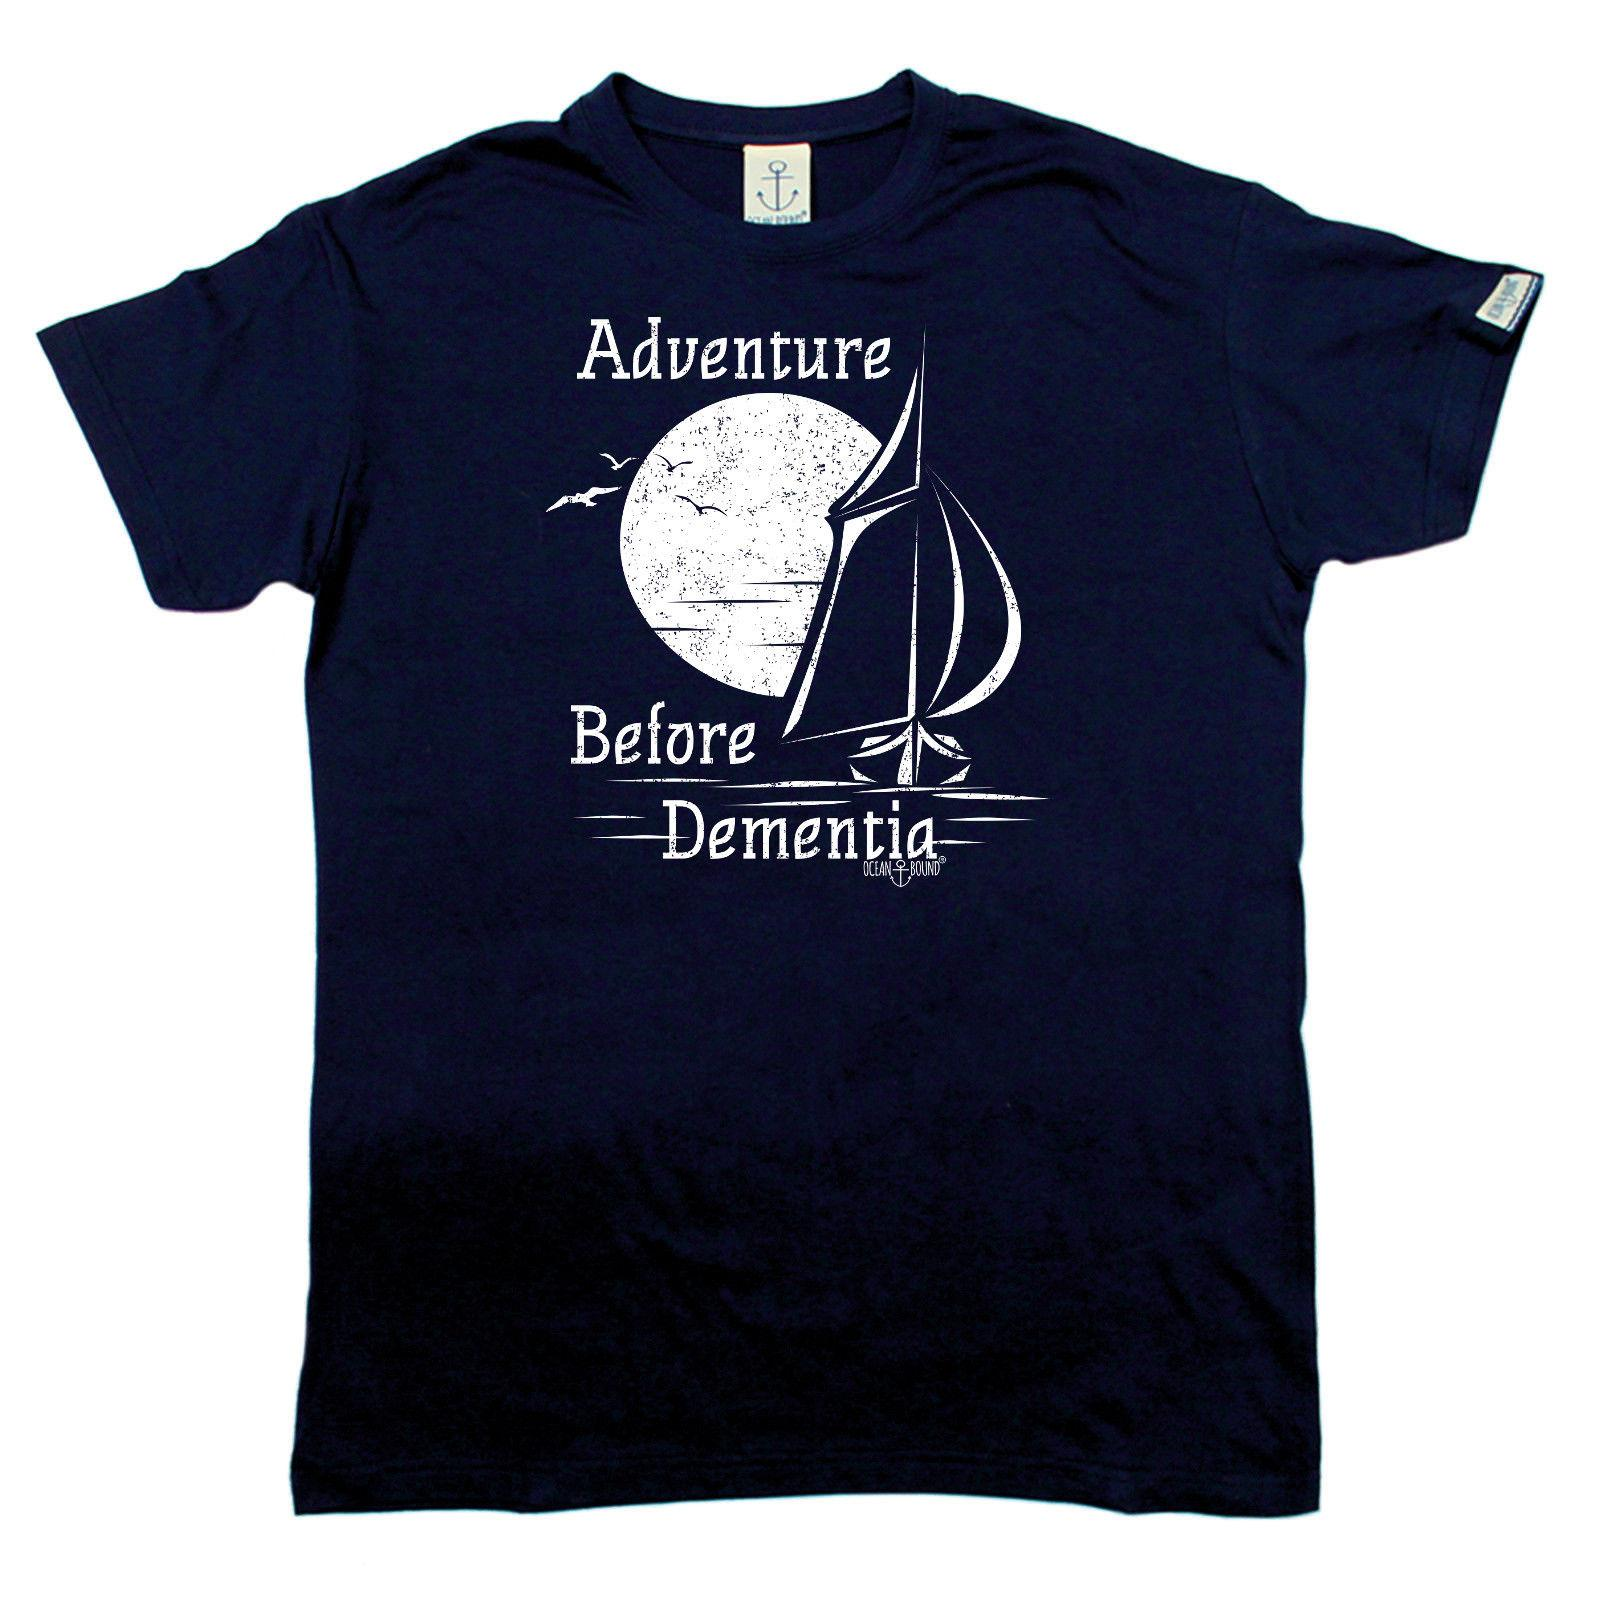 375d55da1cd Sailing T Shirt Funny Novelty Mens Tee TShirt NAOB1 T Shirts Boat T Shirts  Te Men Women Unisex Fashion Tshirt Design Own T Shirt T Shirt Making From  ...